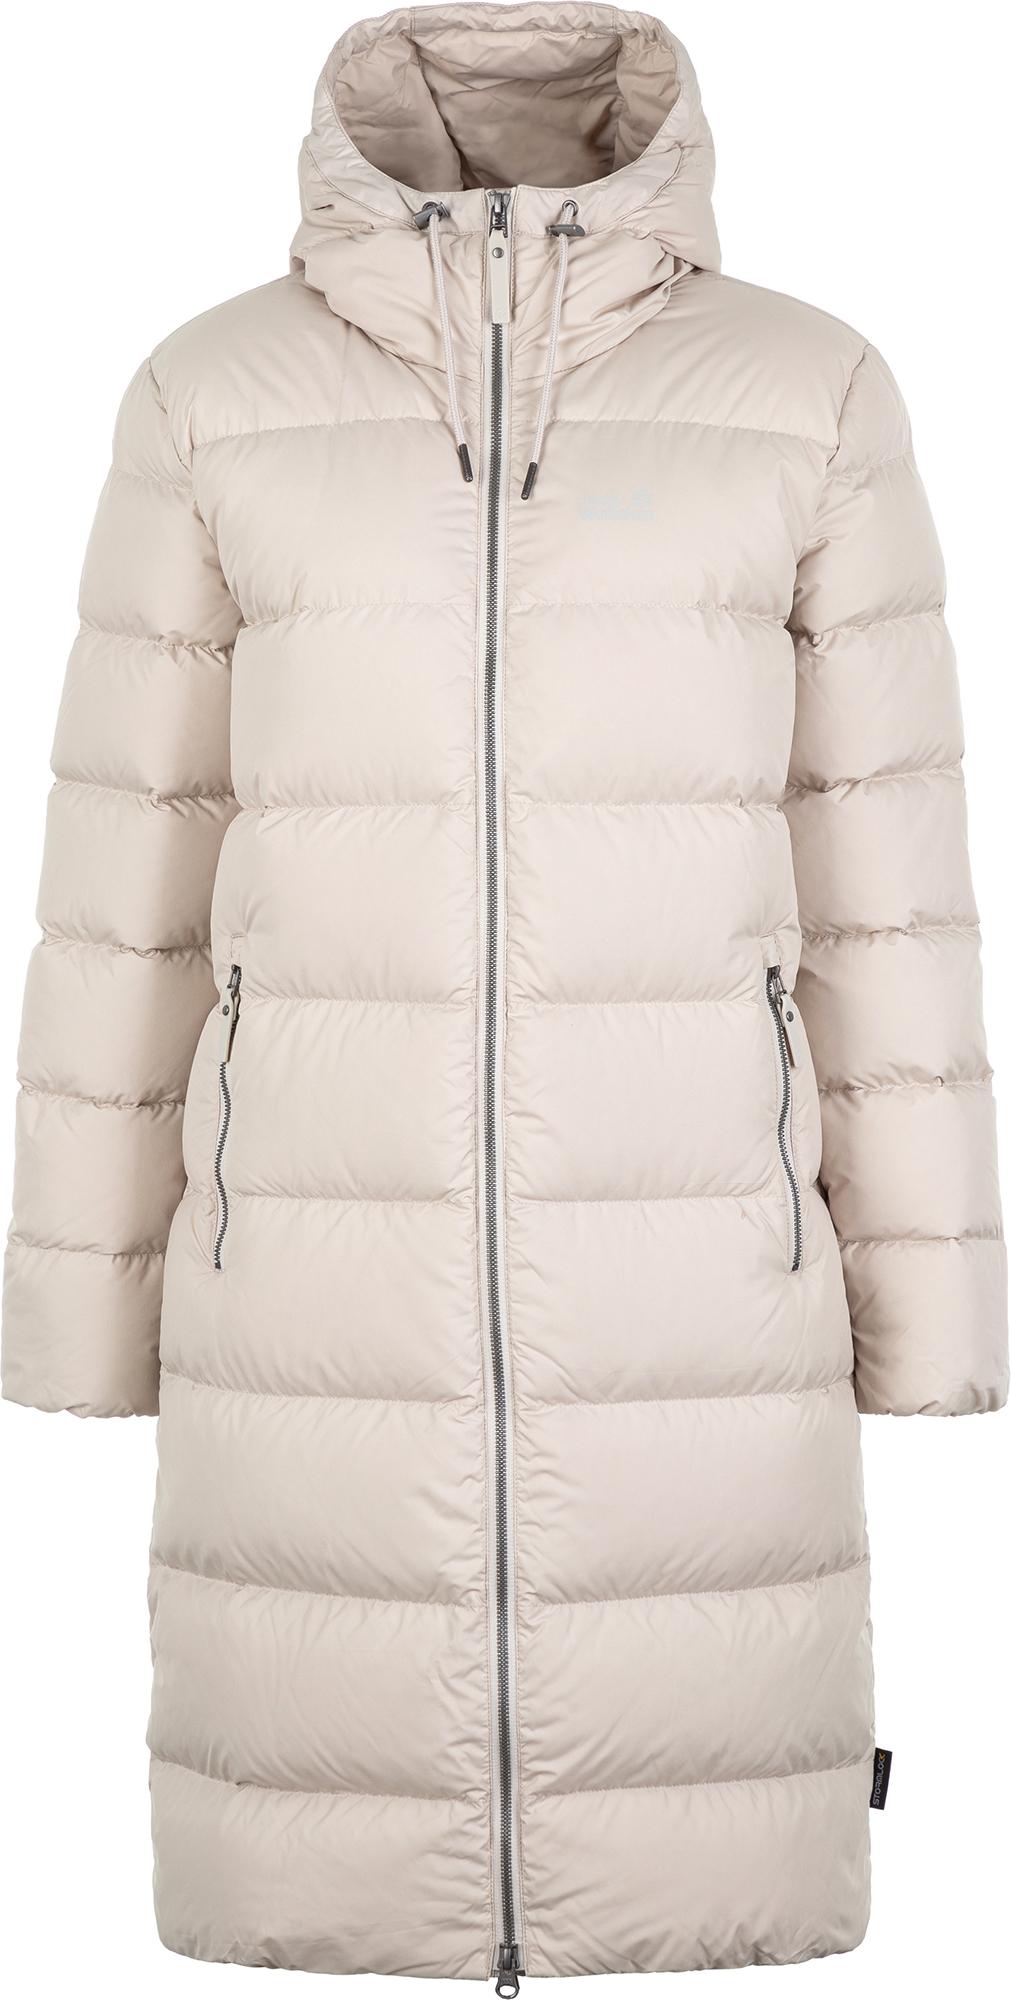 Jack Wolfskin Куртка пуховая женская Jack Wolfskin Crystal Palace, размер 44